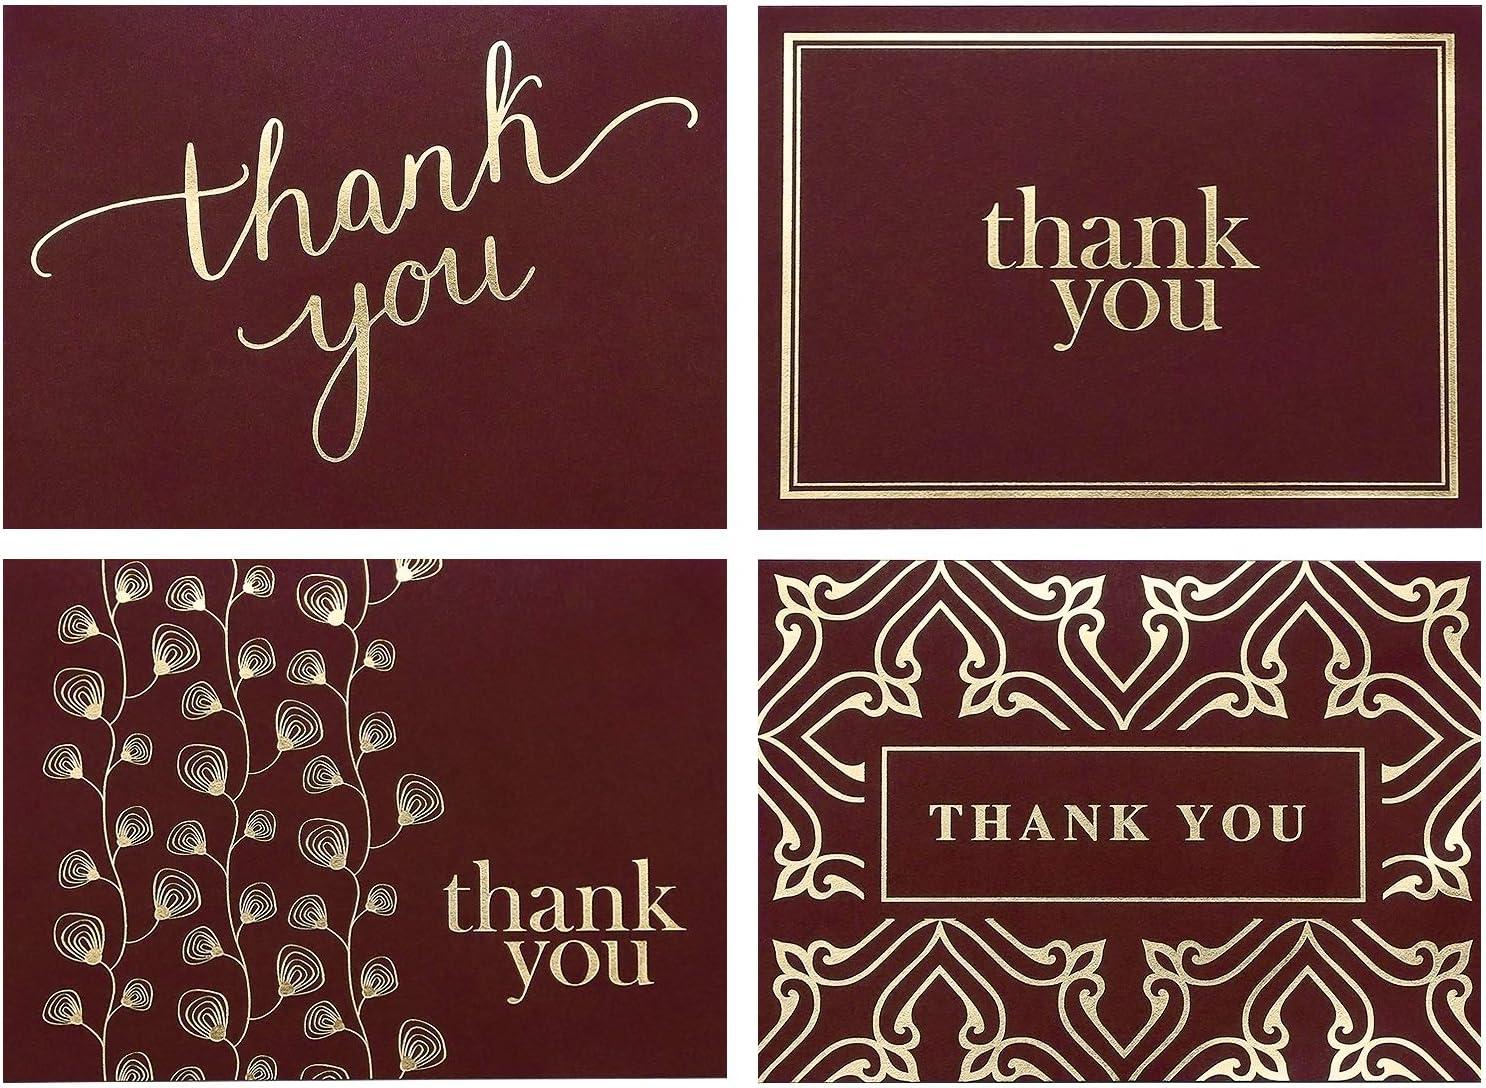 Burgundy Floral Wedding Thank You Cards Bridal Shower Thank You Cards Note Cards with Envelopes Thank You Cards Wedding